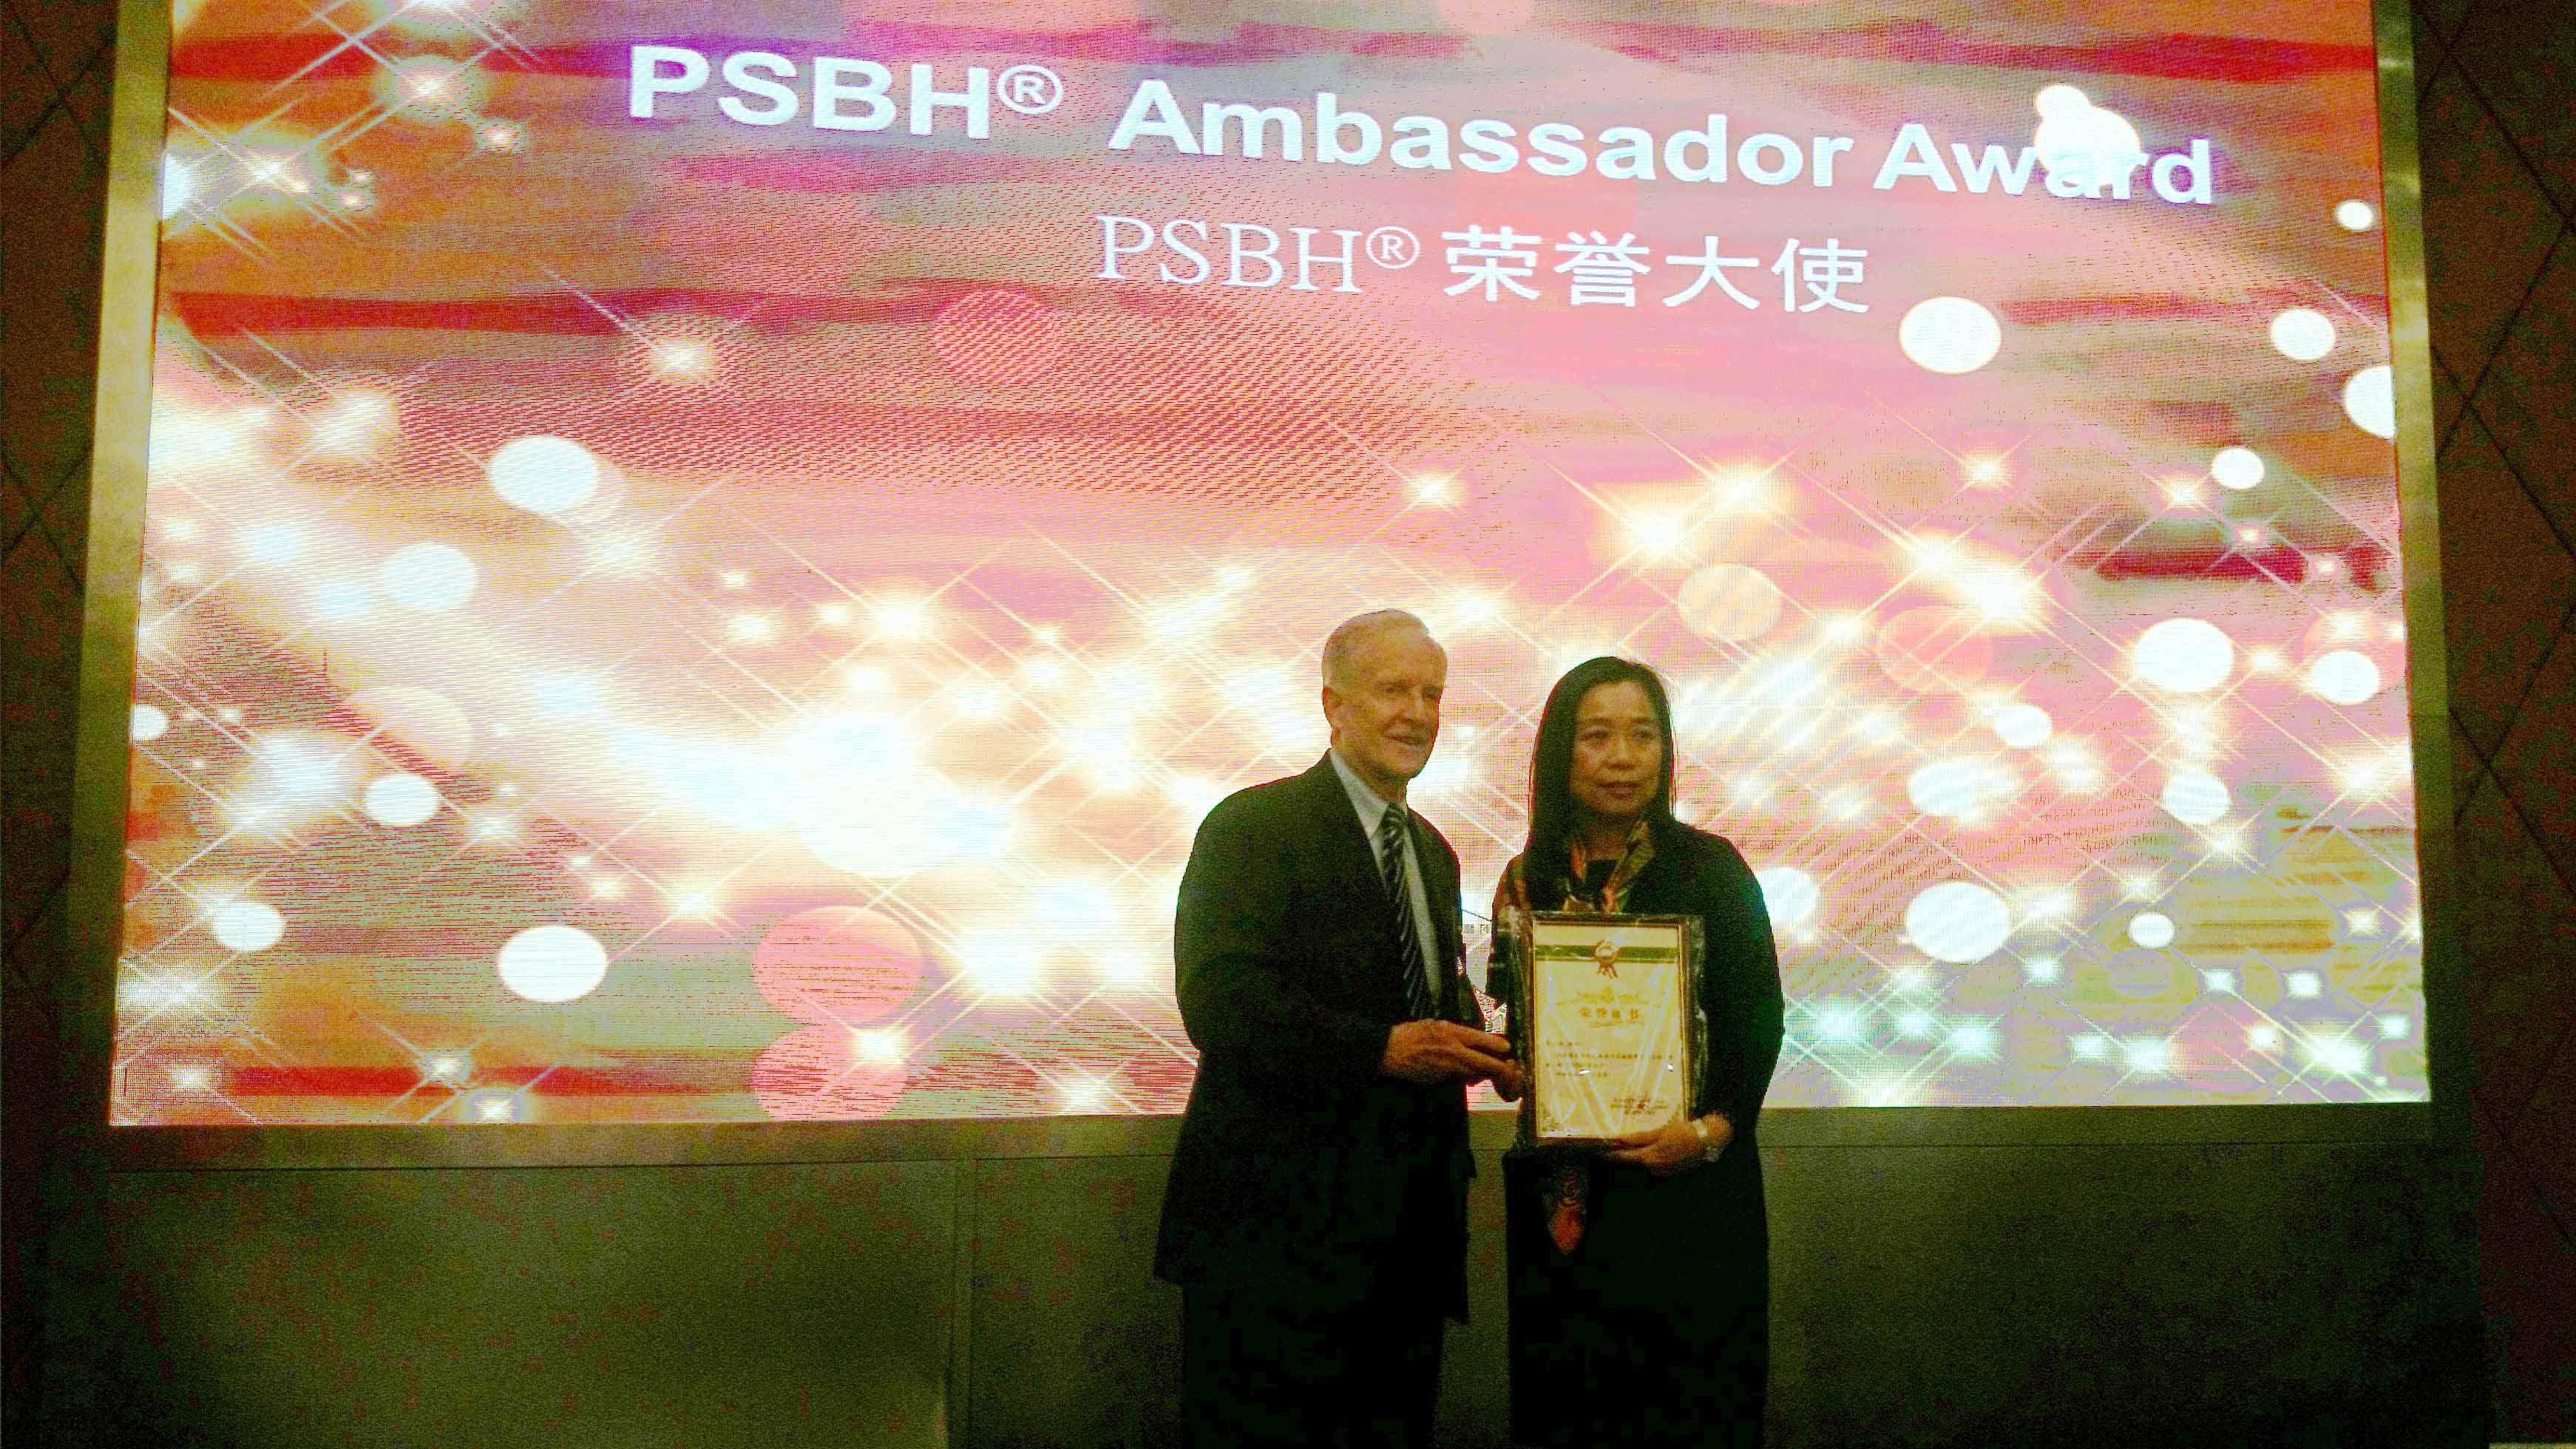 PSBH Ambassador Award